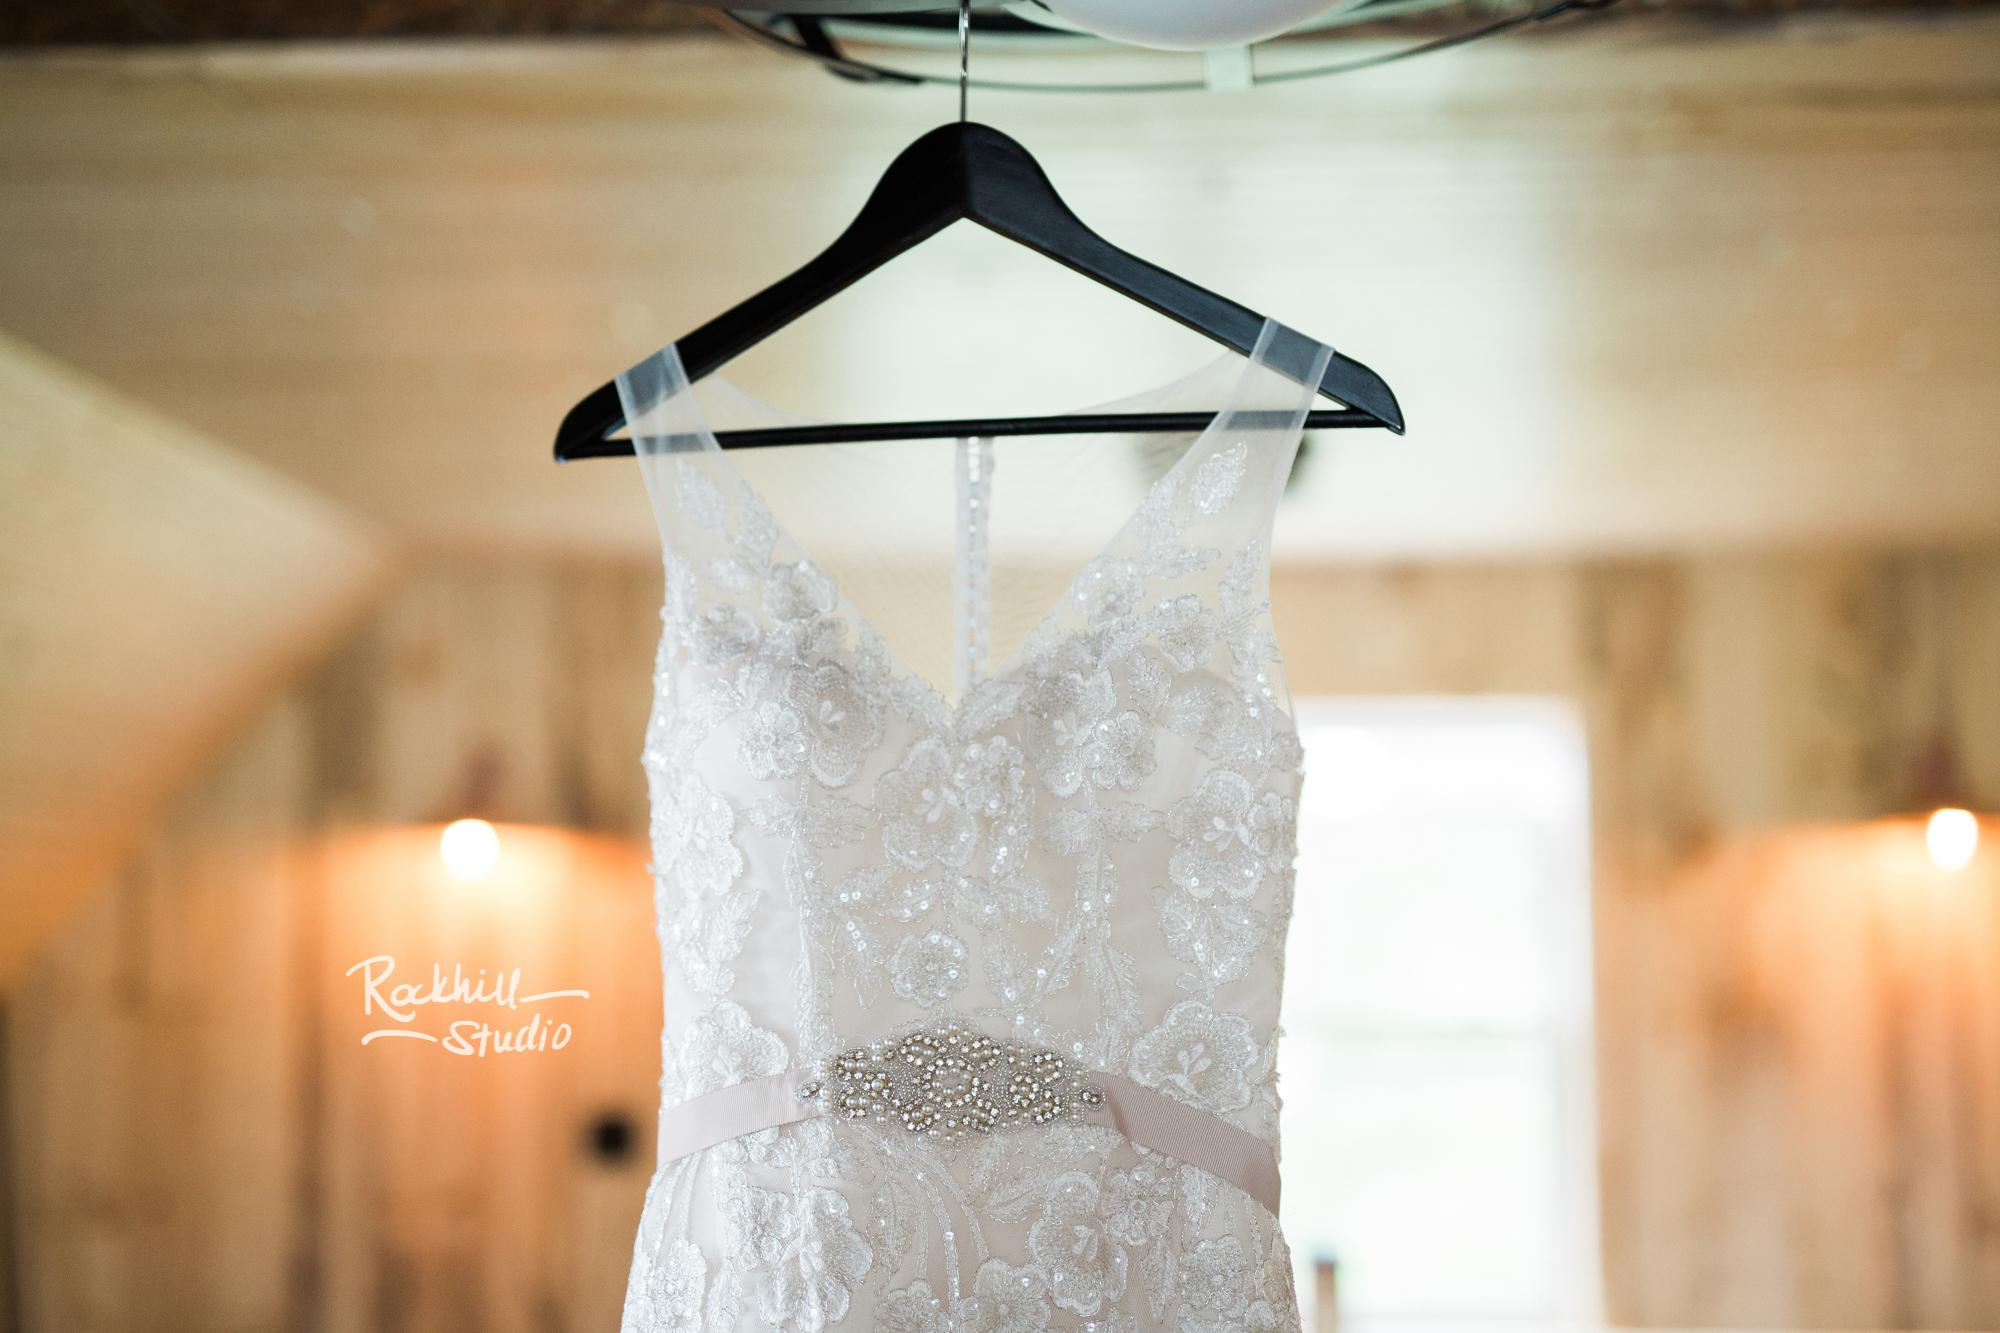 newberry-michigan-wedding-upper-peninsula-spring-photography-rockhill-ee-2.jpg